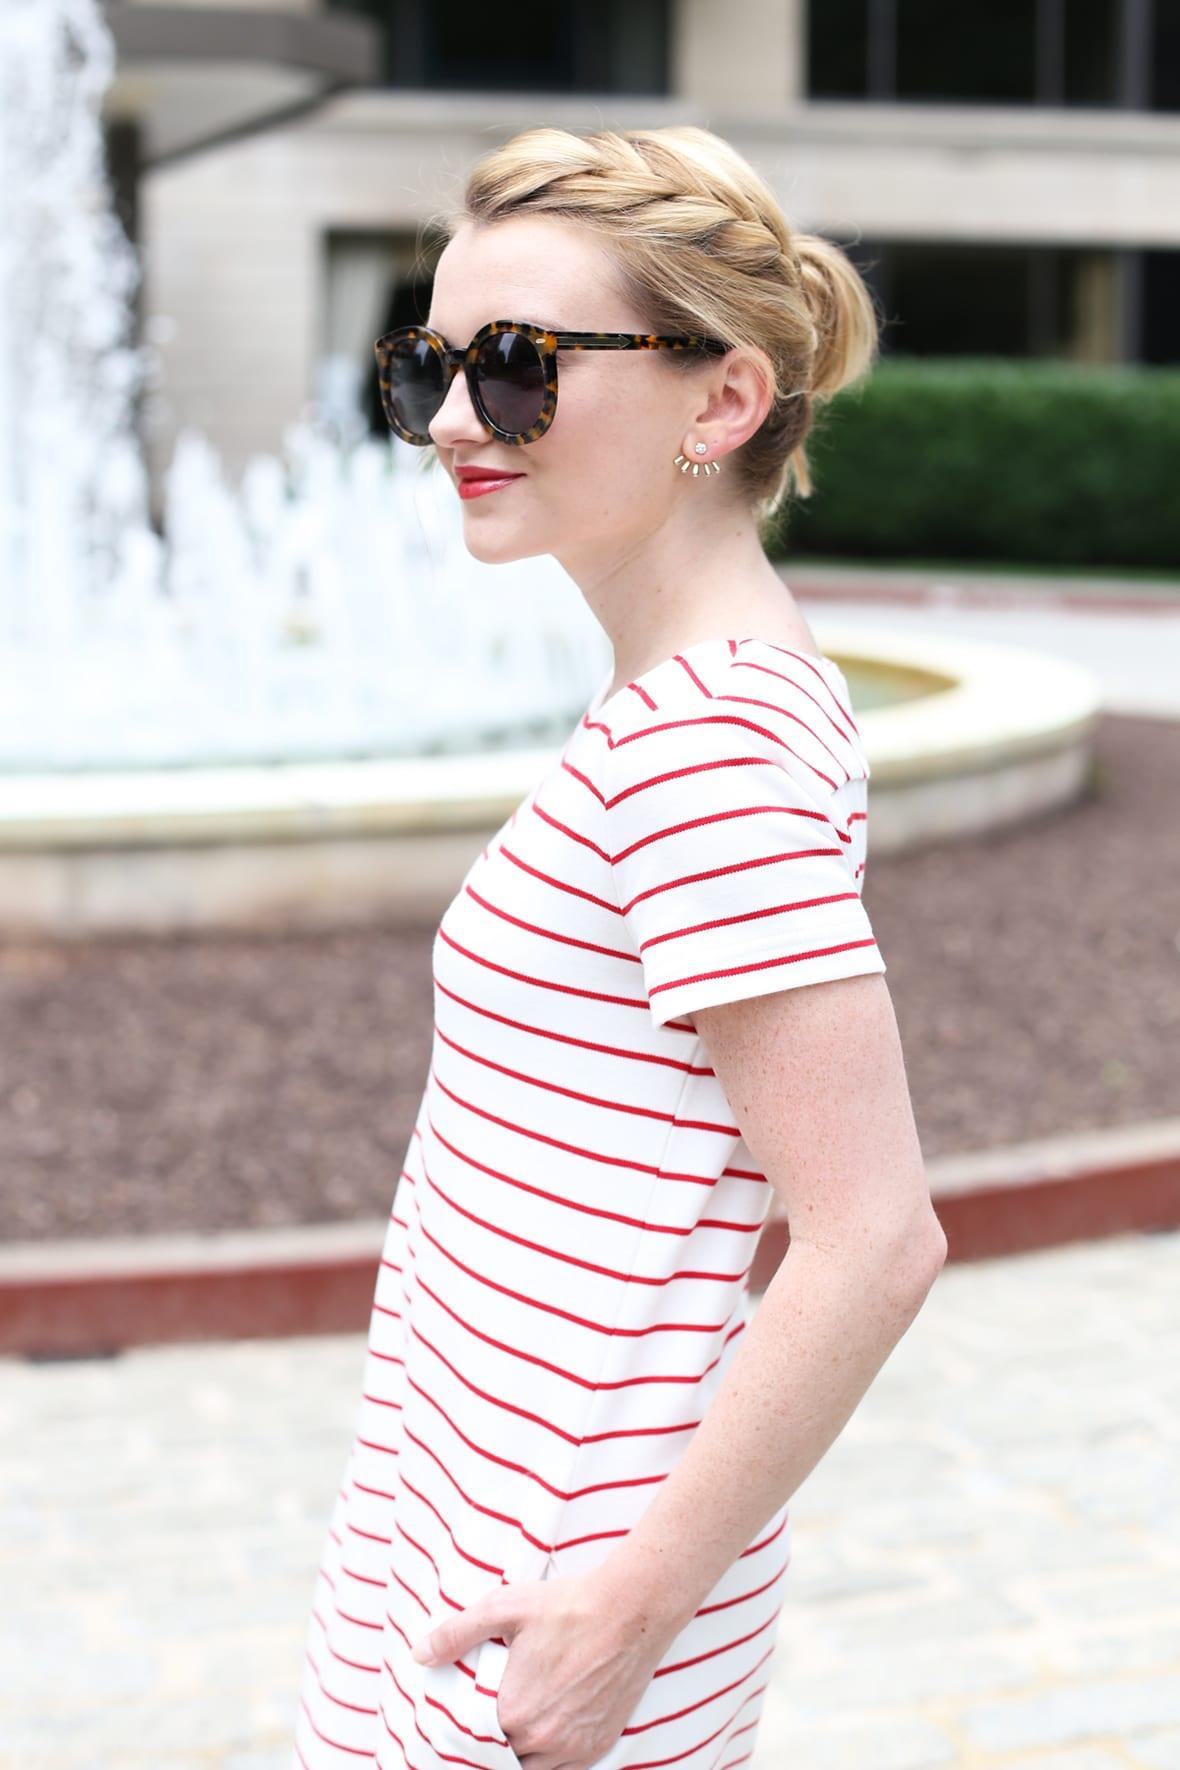 Red Striped T-shirt Dress at Poor Little It Girl - via @poorlilitgirl